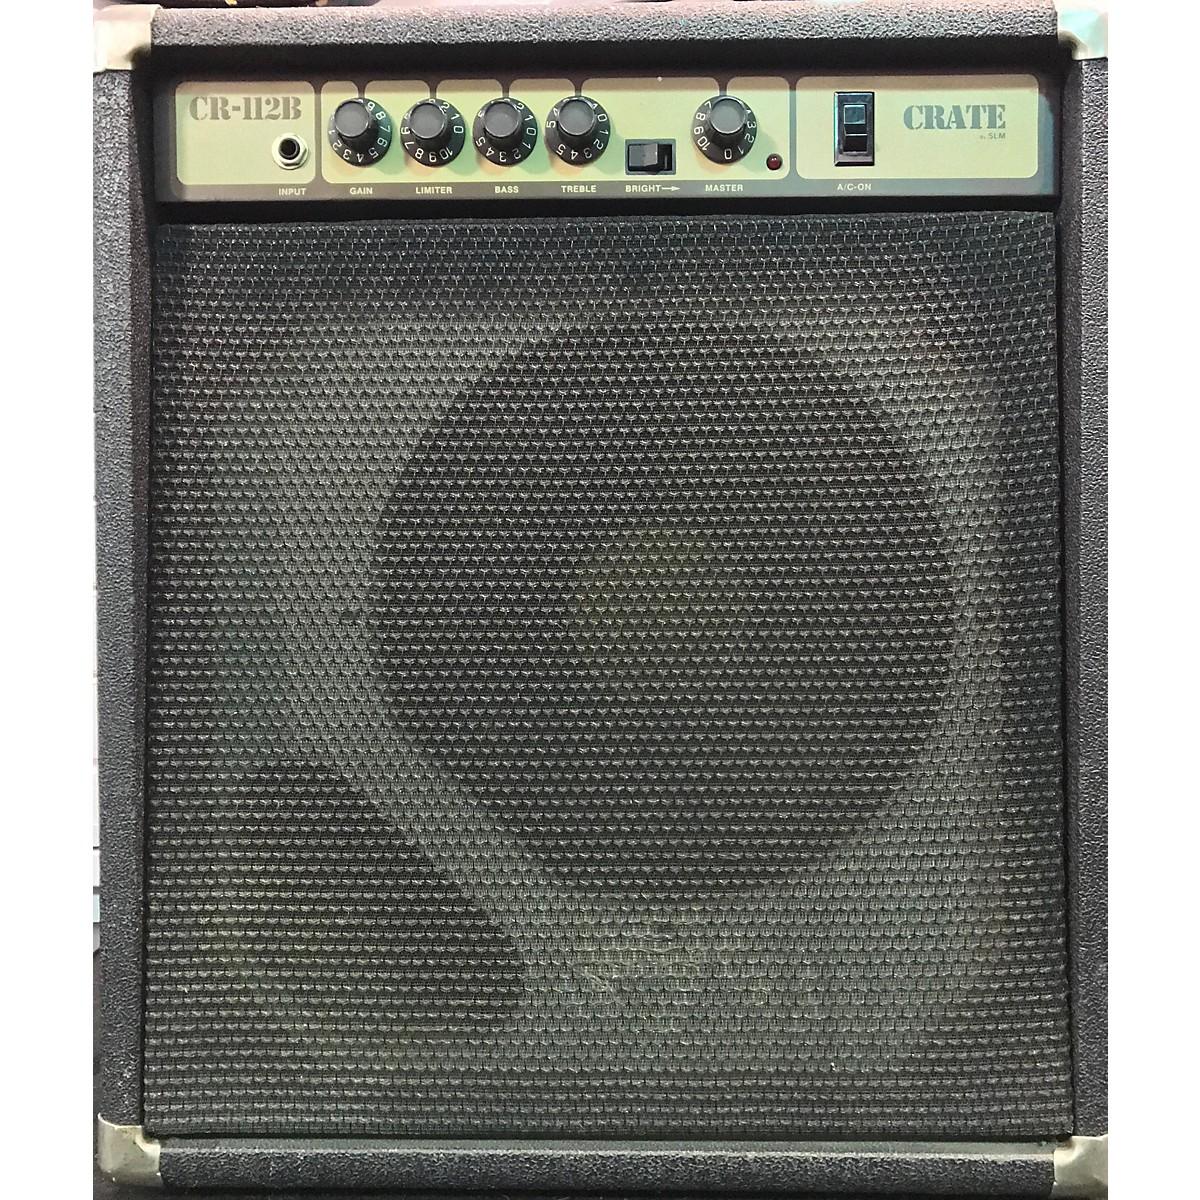 Crate Cr112b Bass Combo Amp